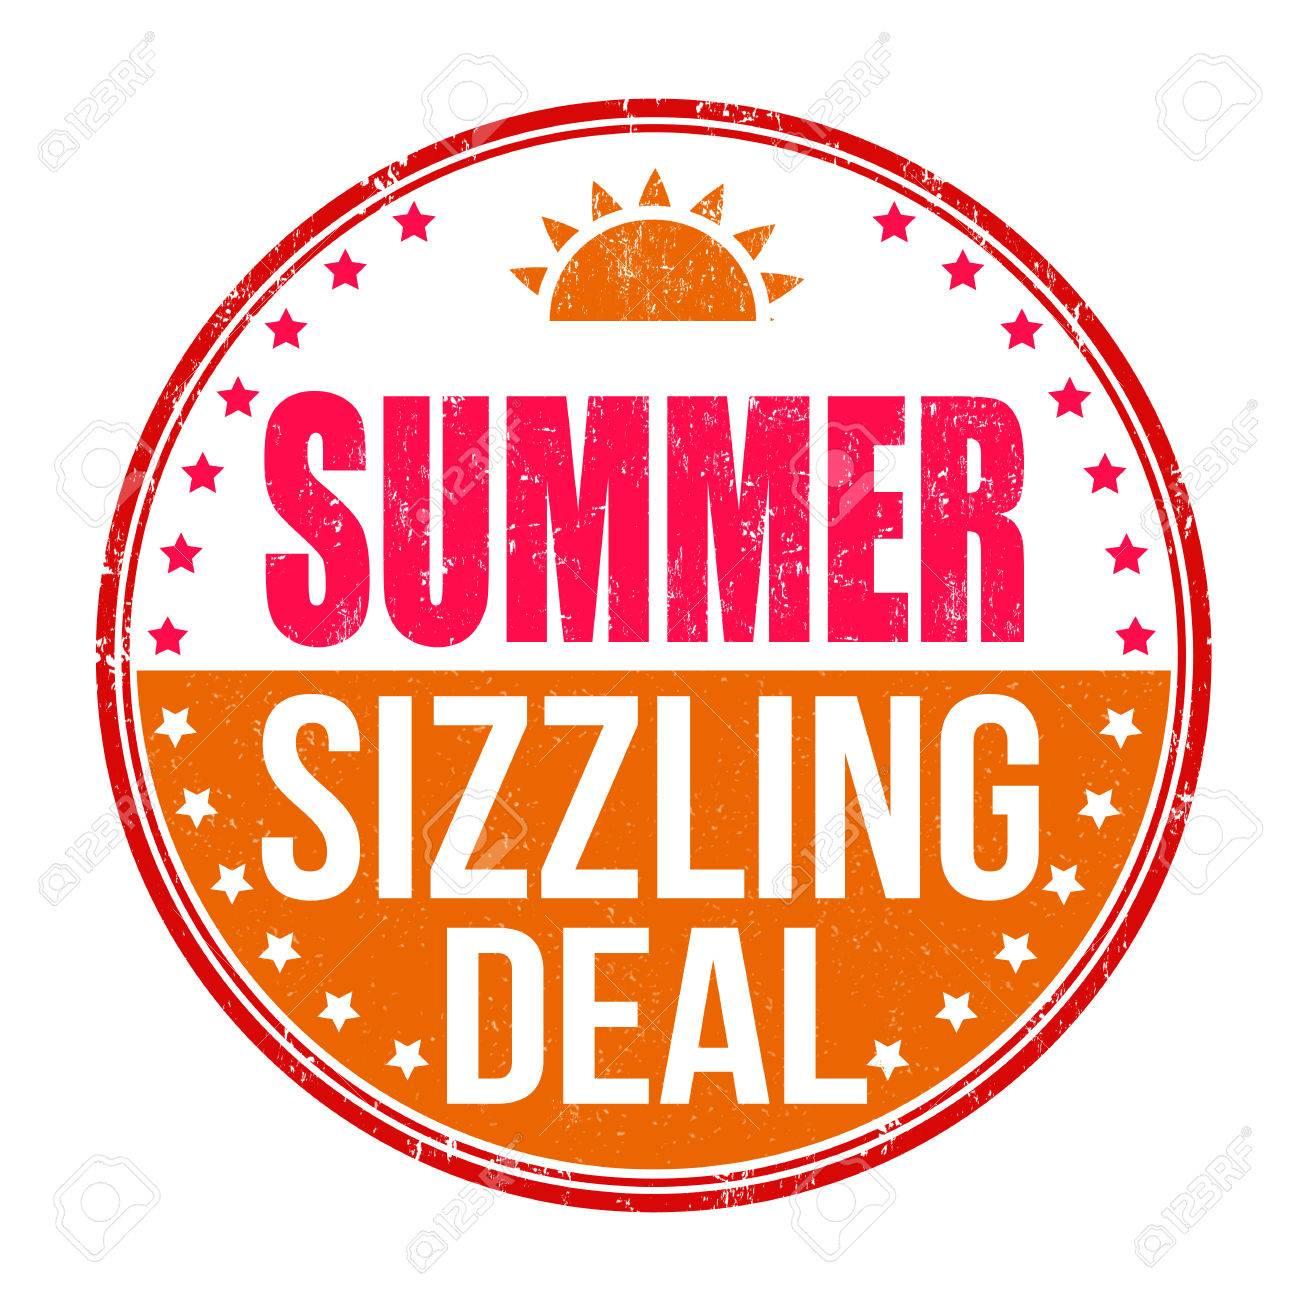 Sizzling summer deal grunge rubber stamp on white background, vector illustration - 39732699